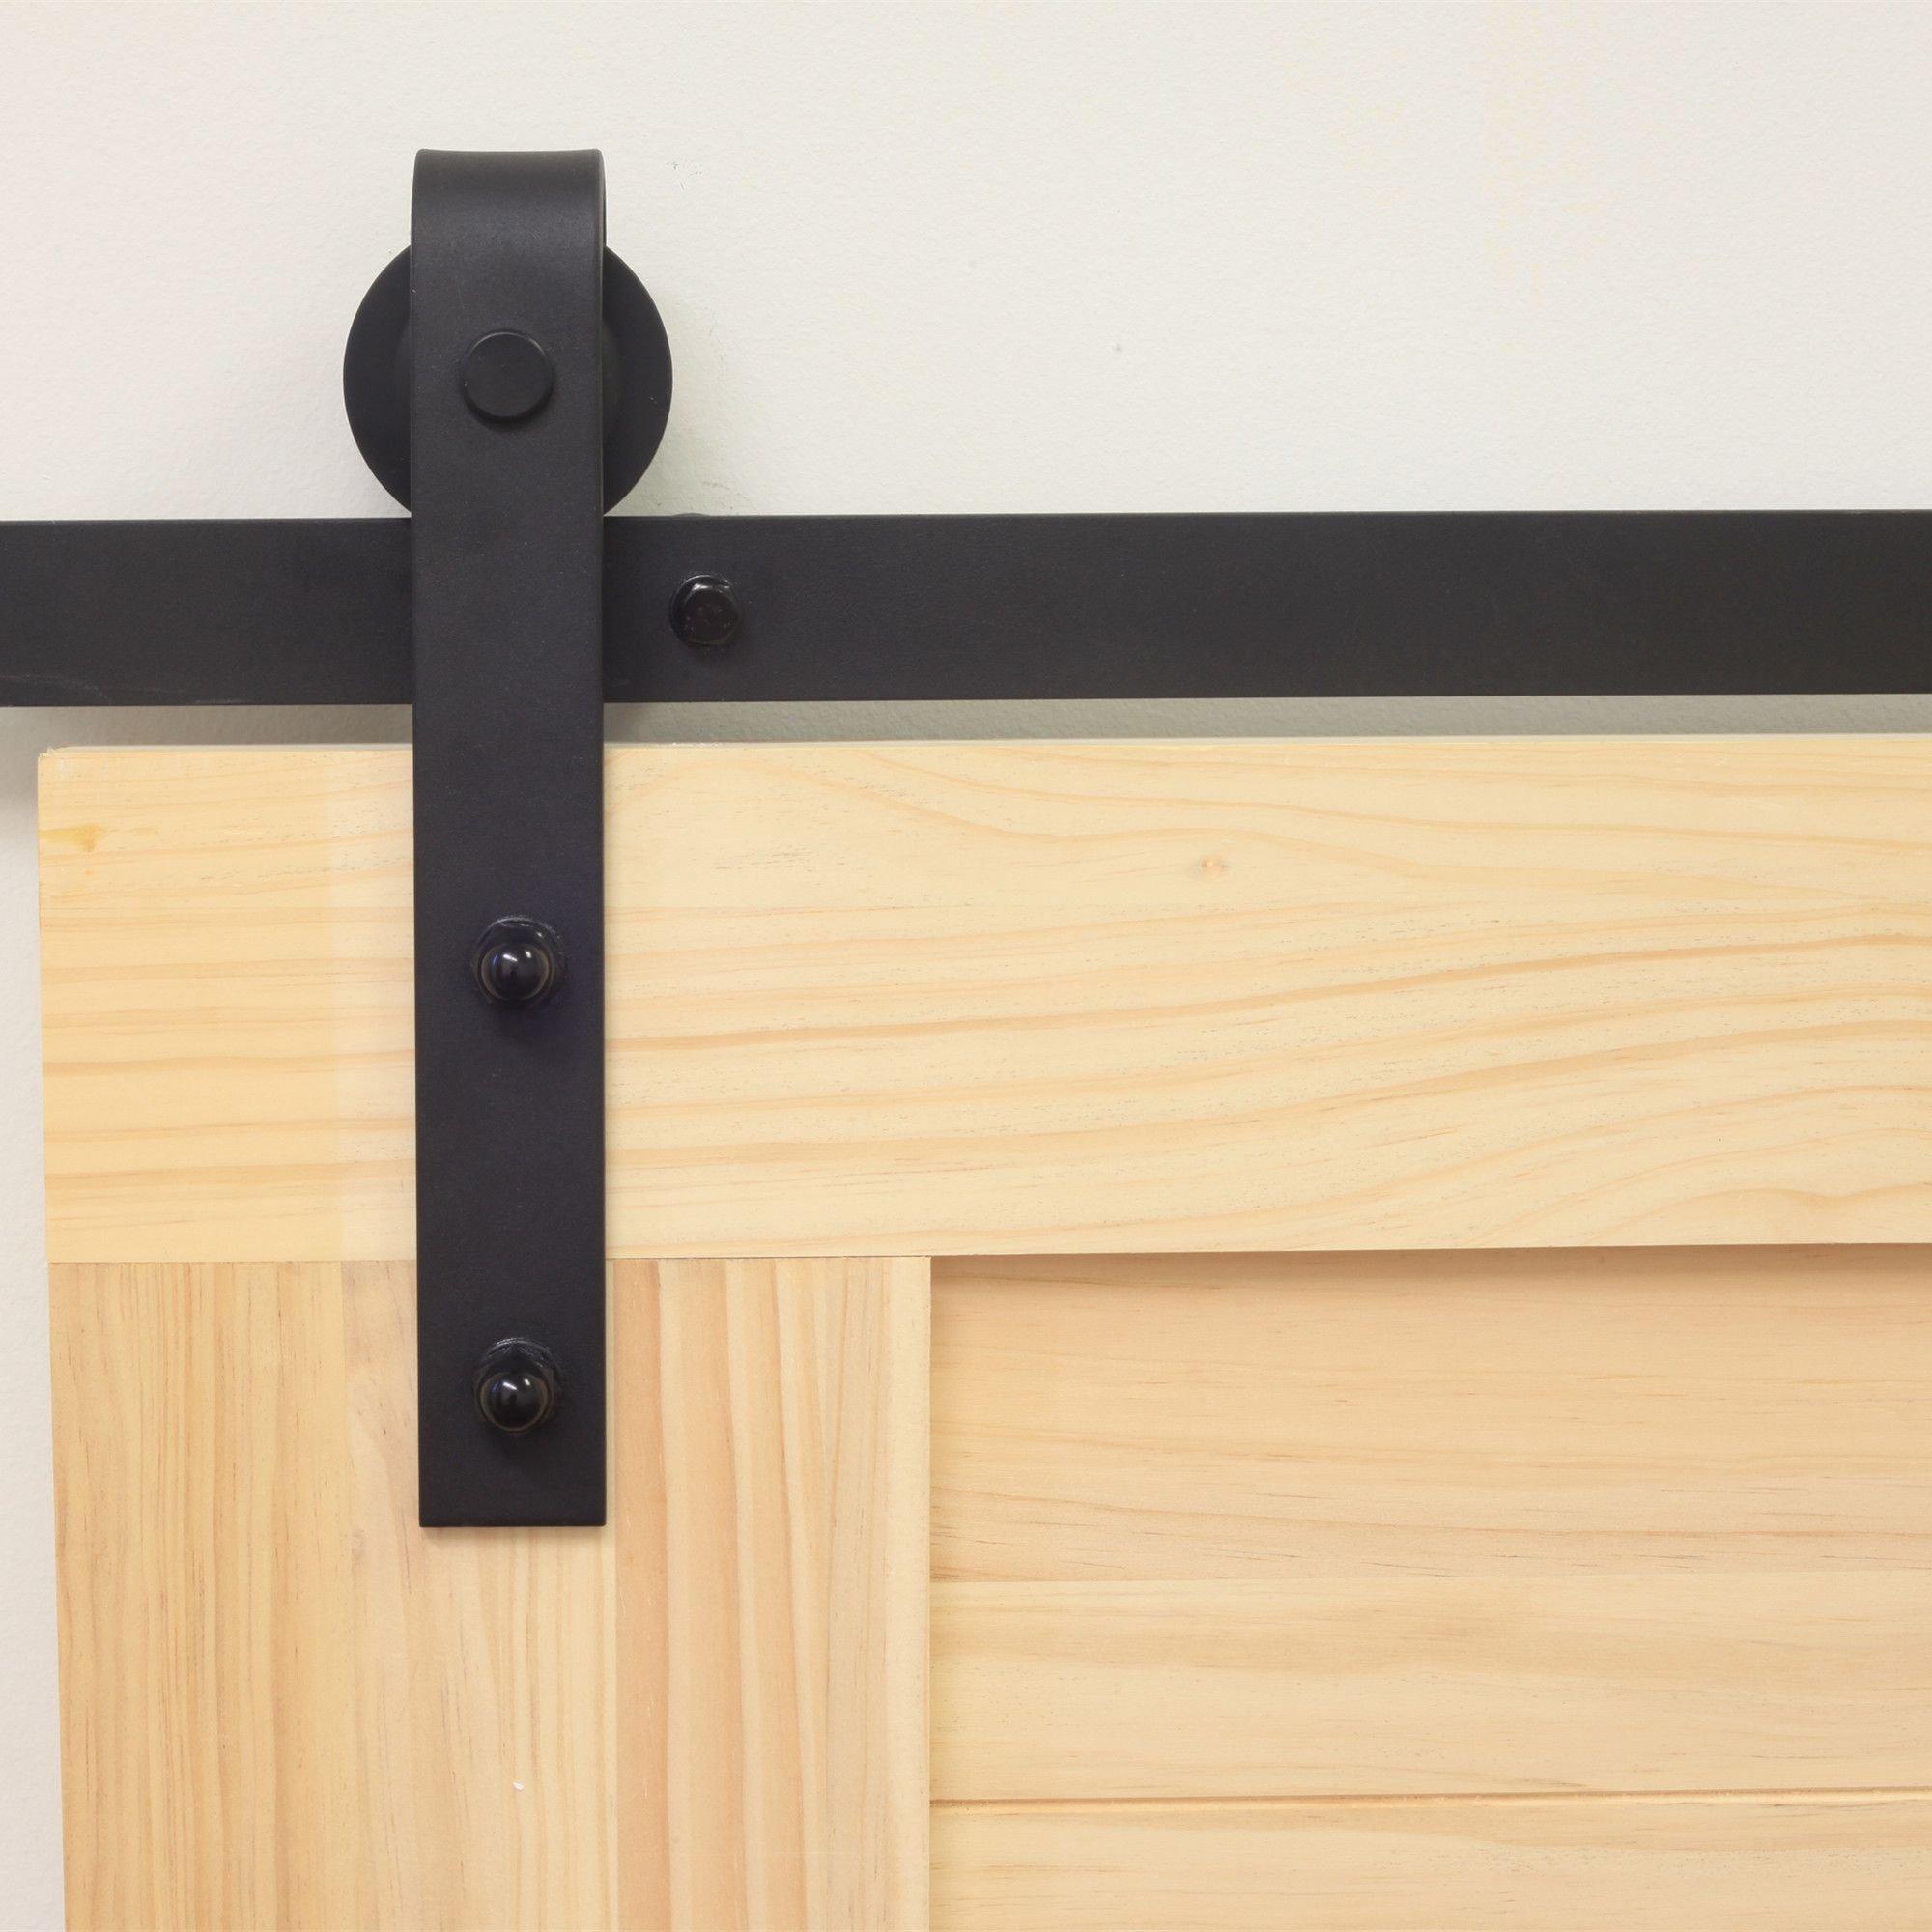 Homacer Sliding Barn Door Hardware Standard Single Door Kit, 5FT Flat Track Classic Design Roller, Black Rustic Heavy Duty Interior Exterior Use